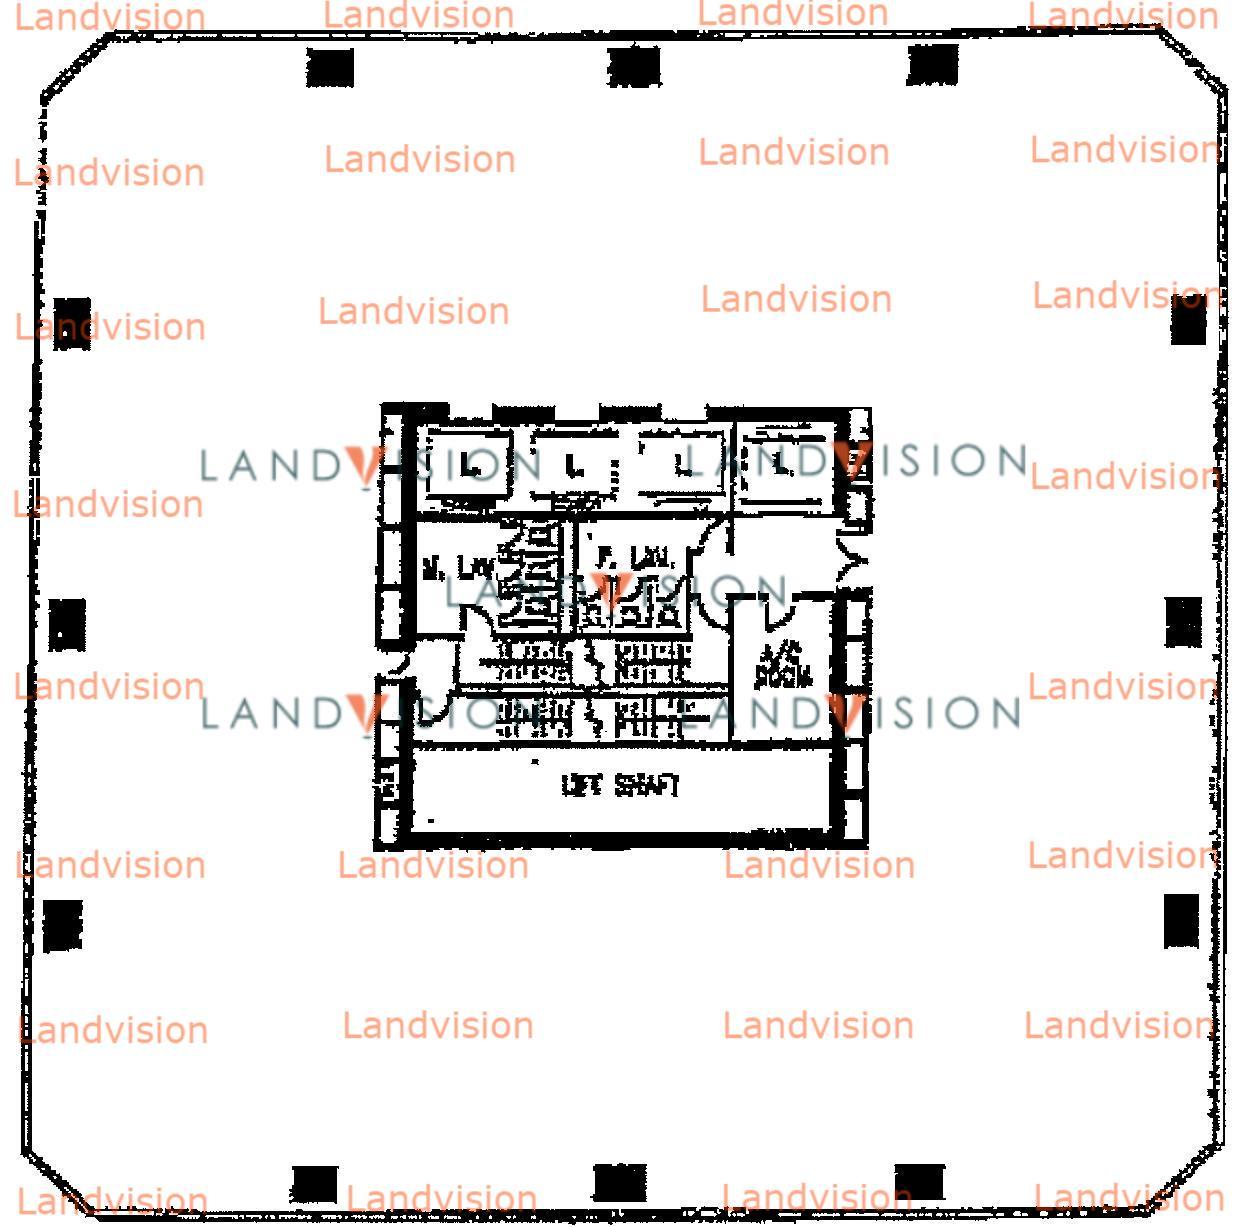 https://www.landvision.com.hk/wp-content/uploads/website/resize/floorplans/000261.JPG